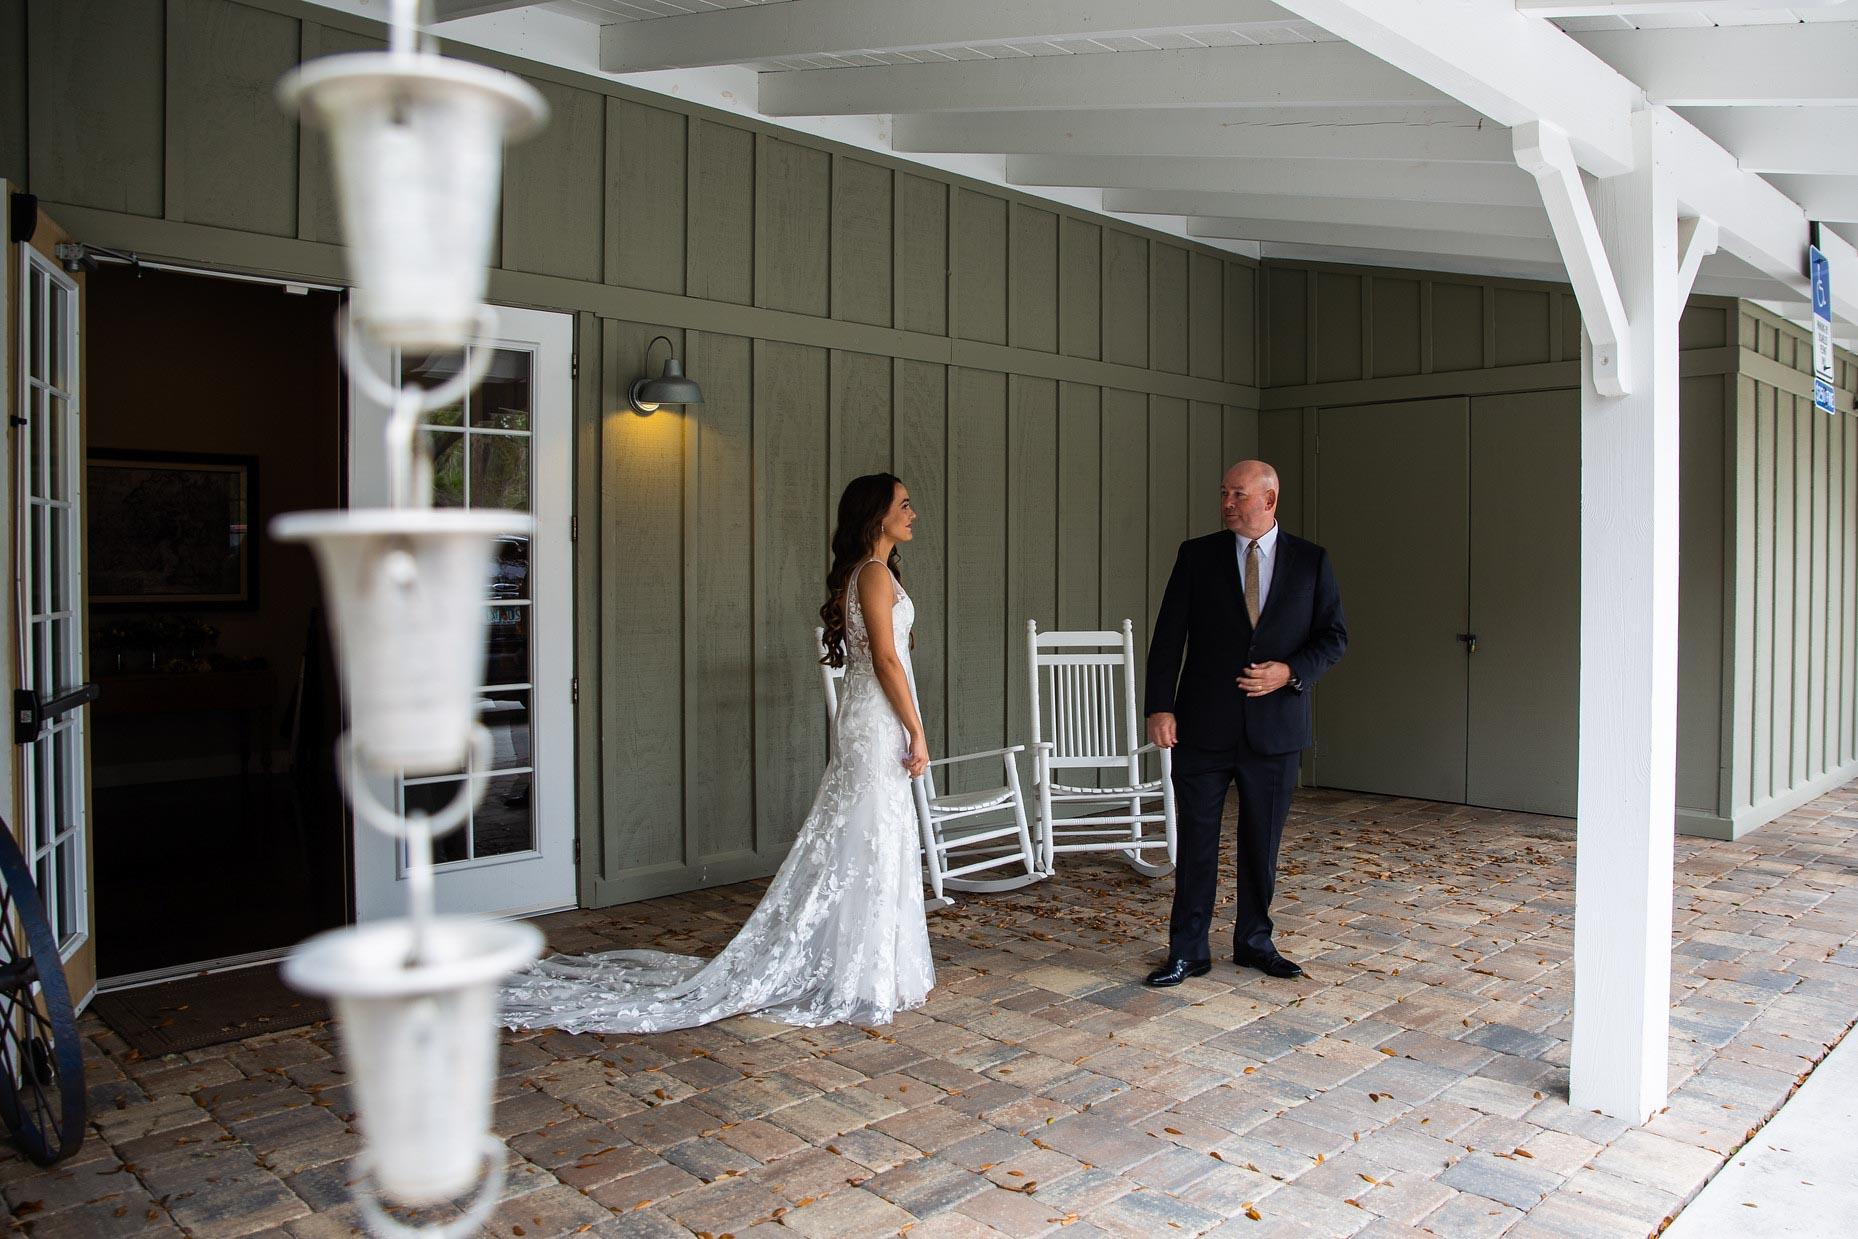 adam-szarmack-bowing-oaks-wedding-photographer-jacksonville-63.jpg